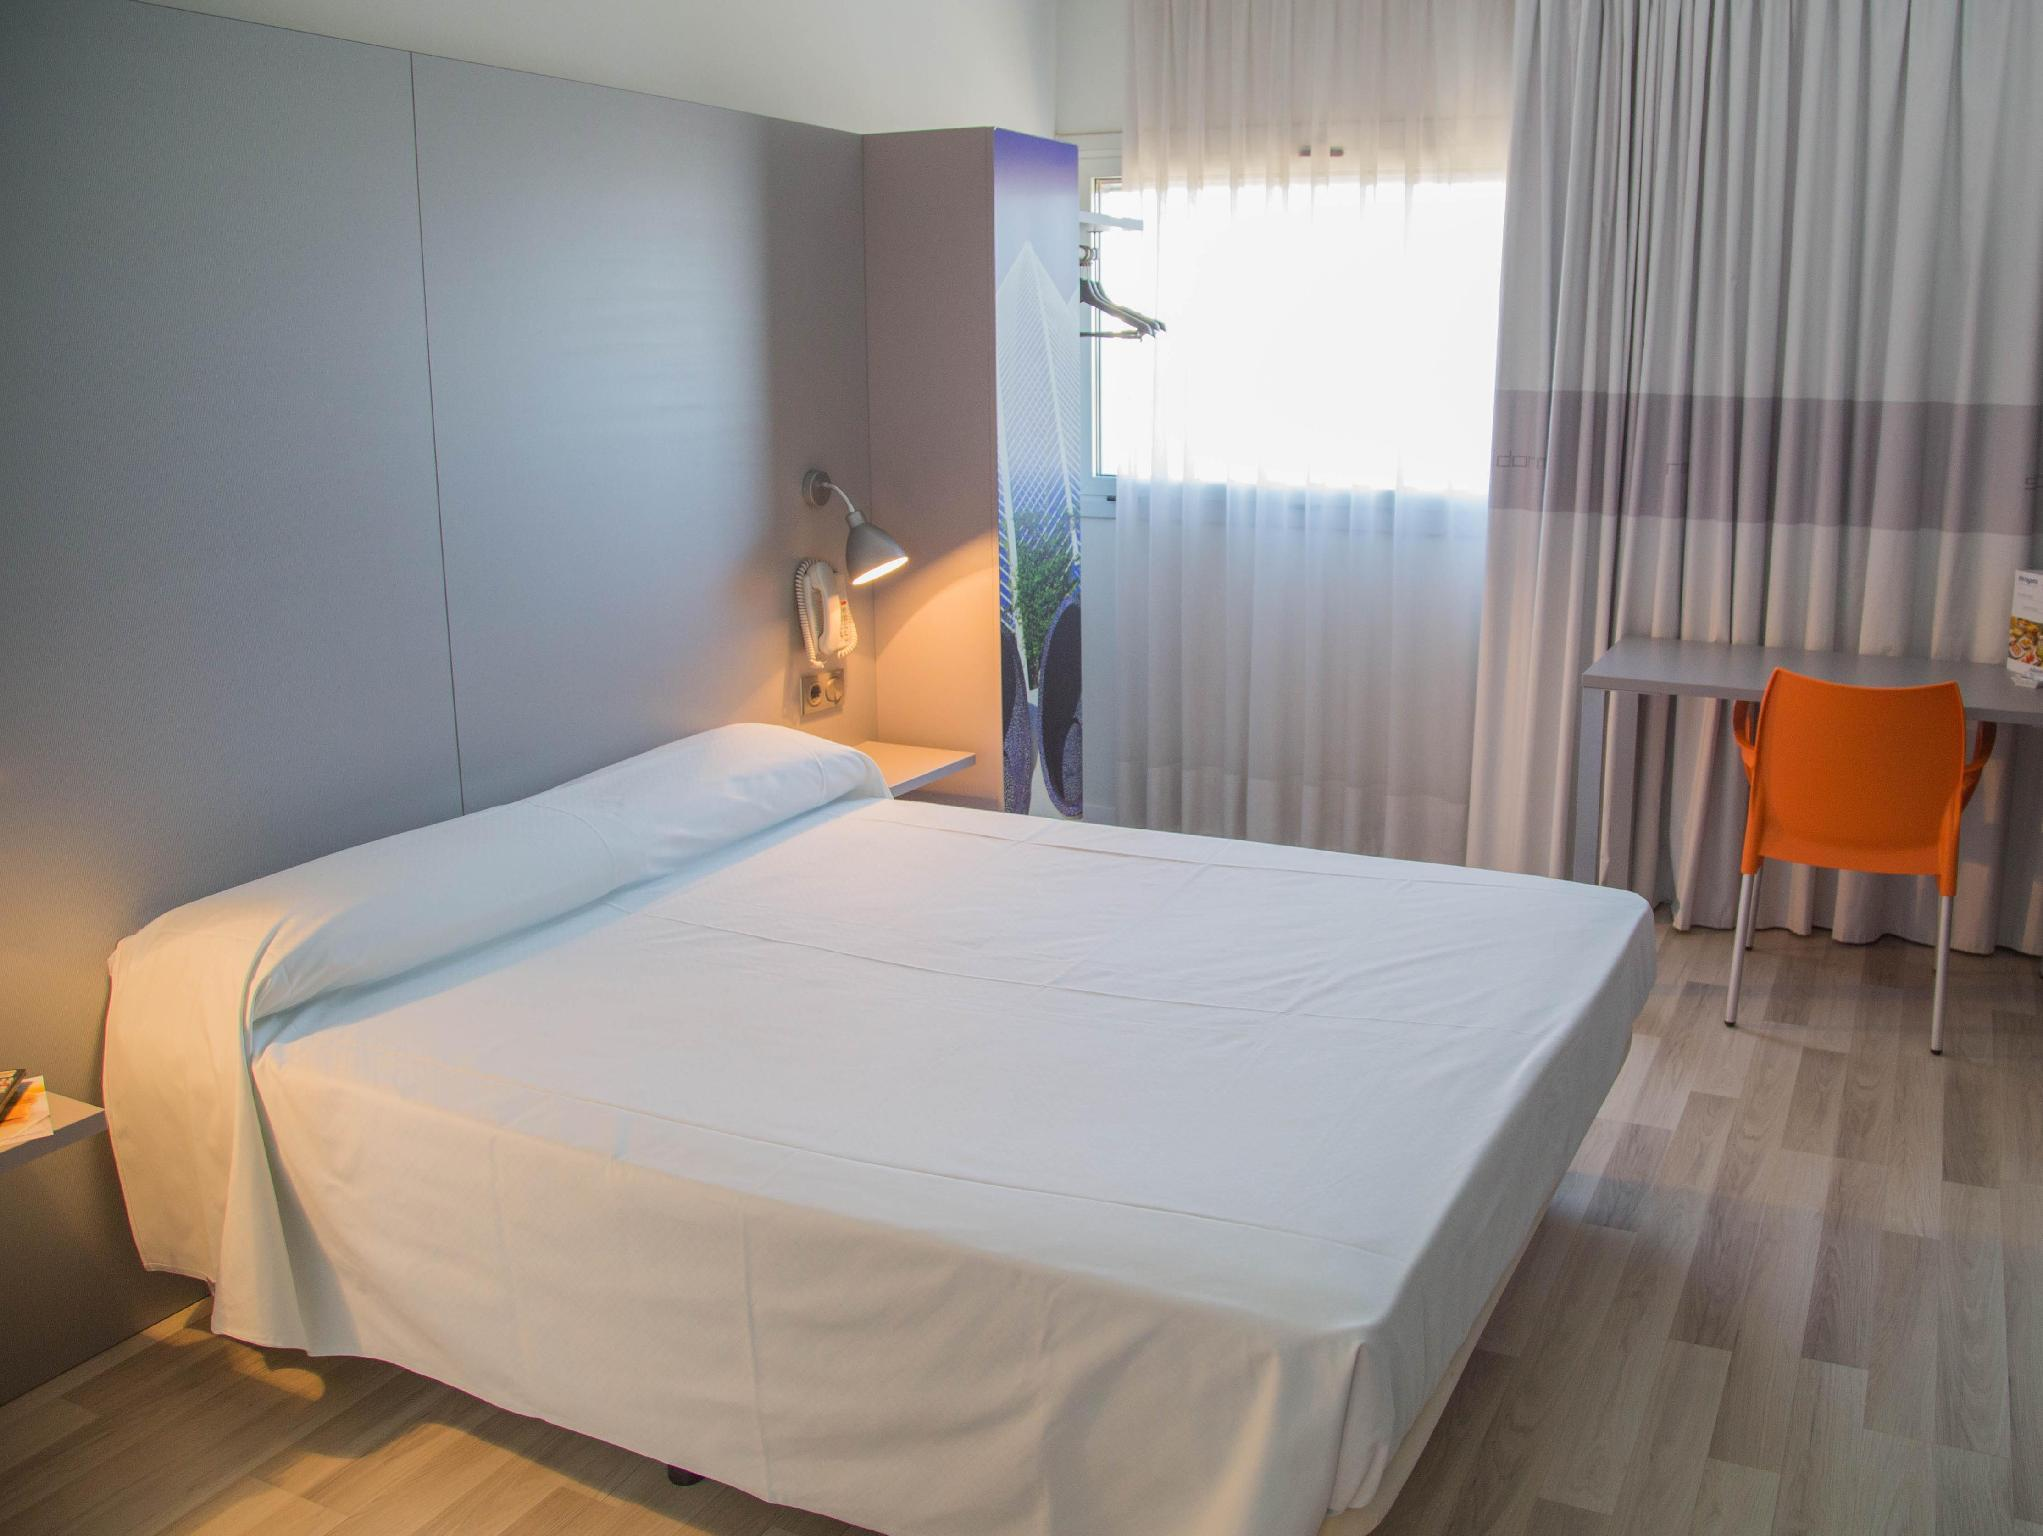 B&B Hotel Valencia – Valencia 2